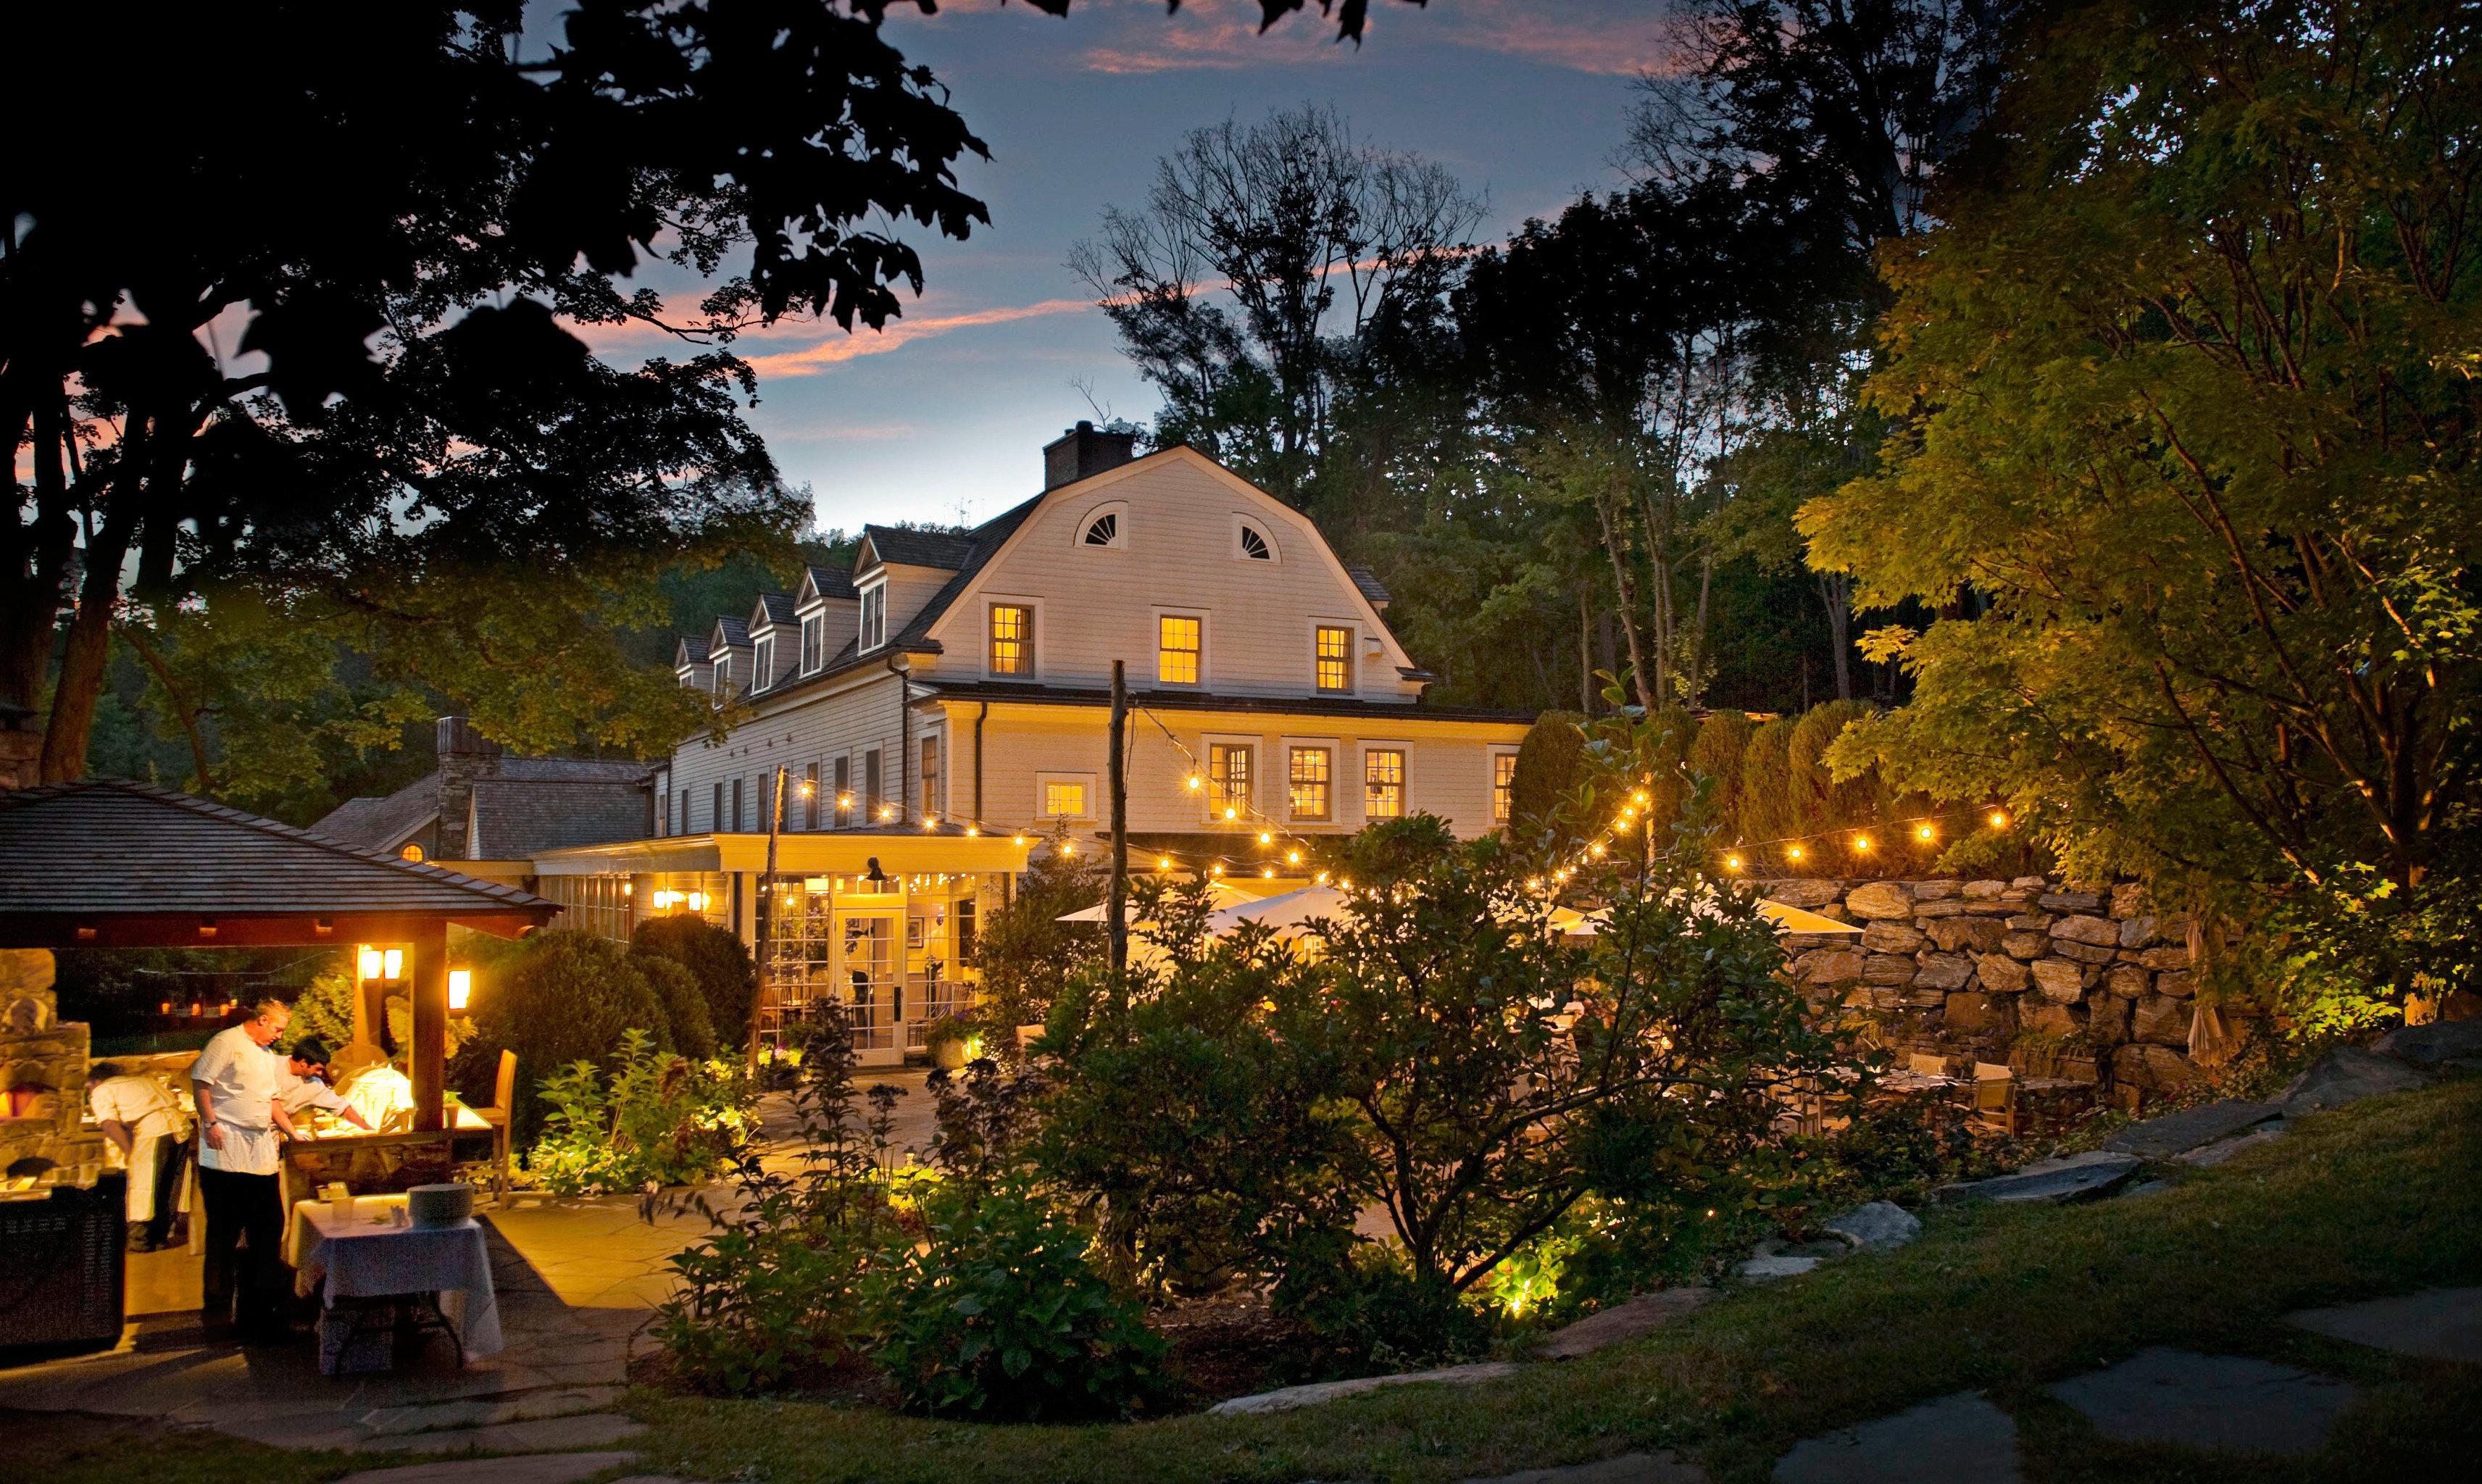 Country Drink Eat Exterior Garden Inn Luxury Modern Patio tree night house evening landscape lighting lighting home autumn flower